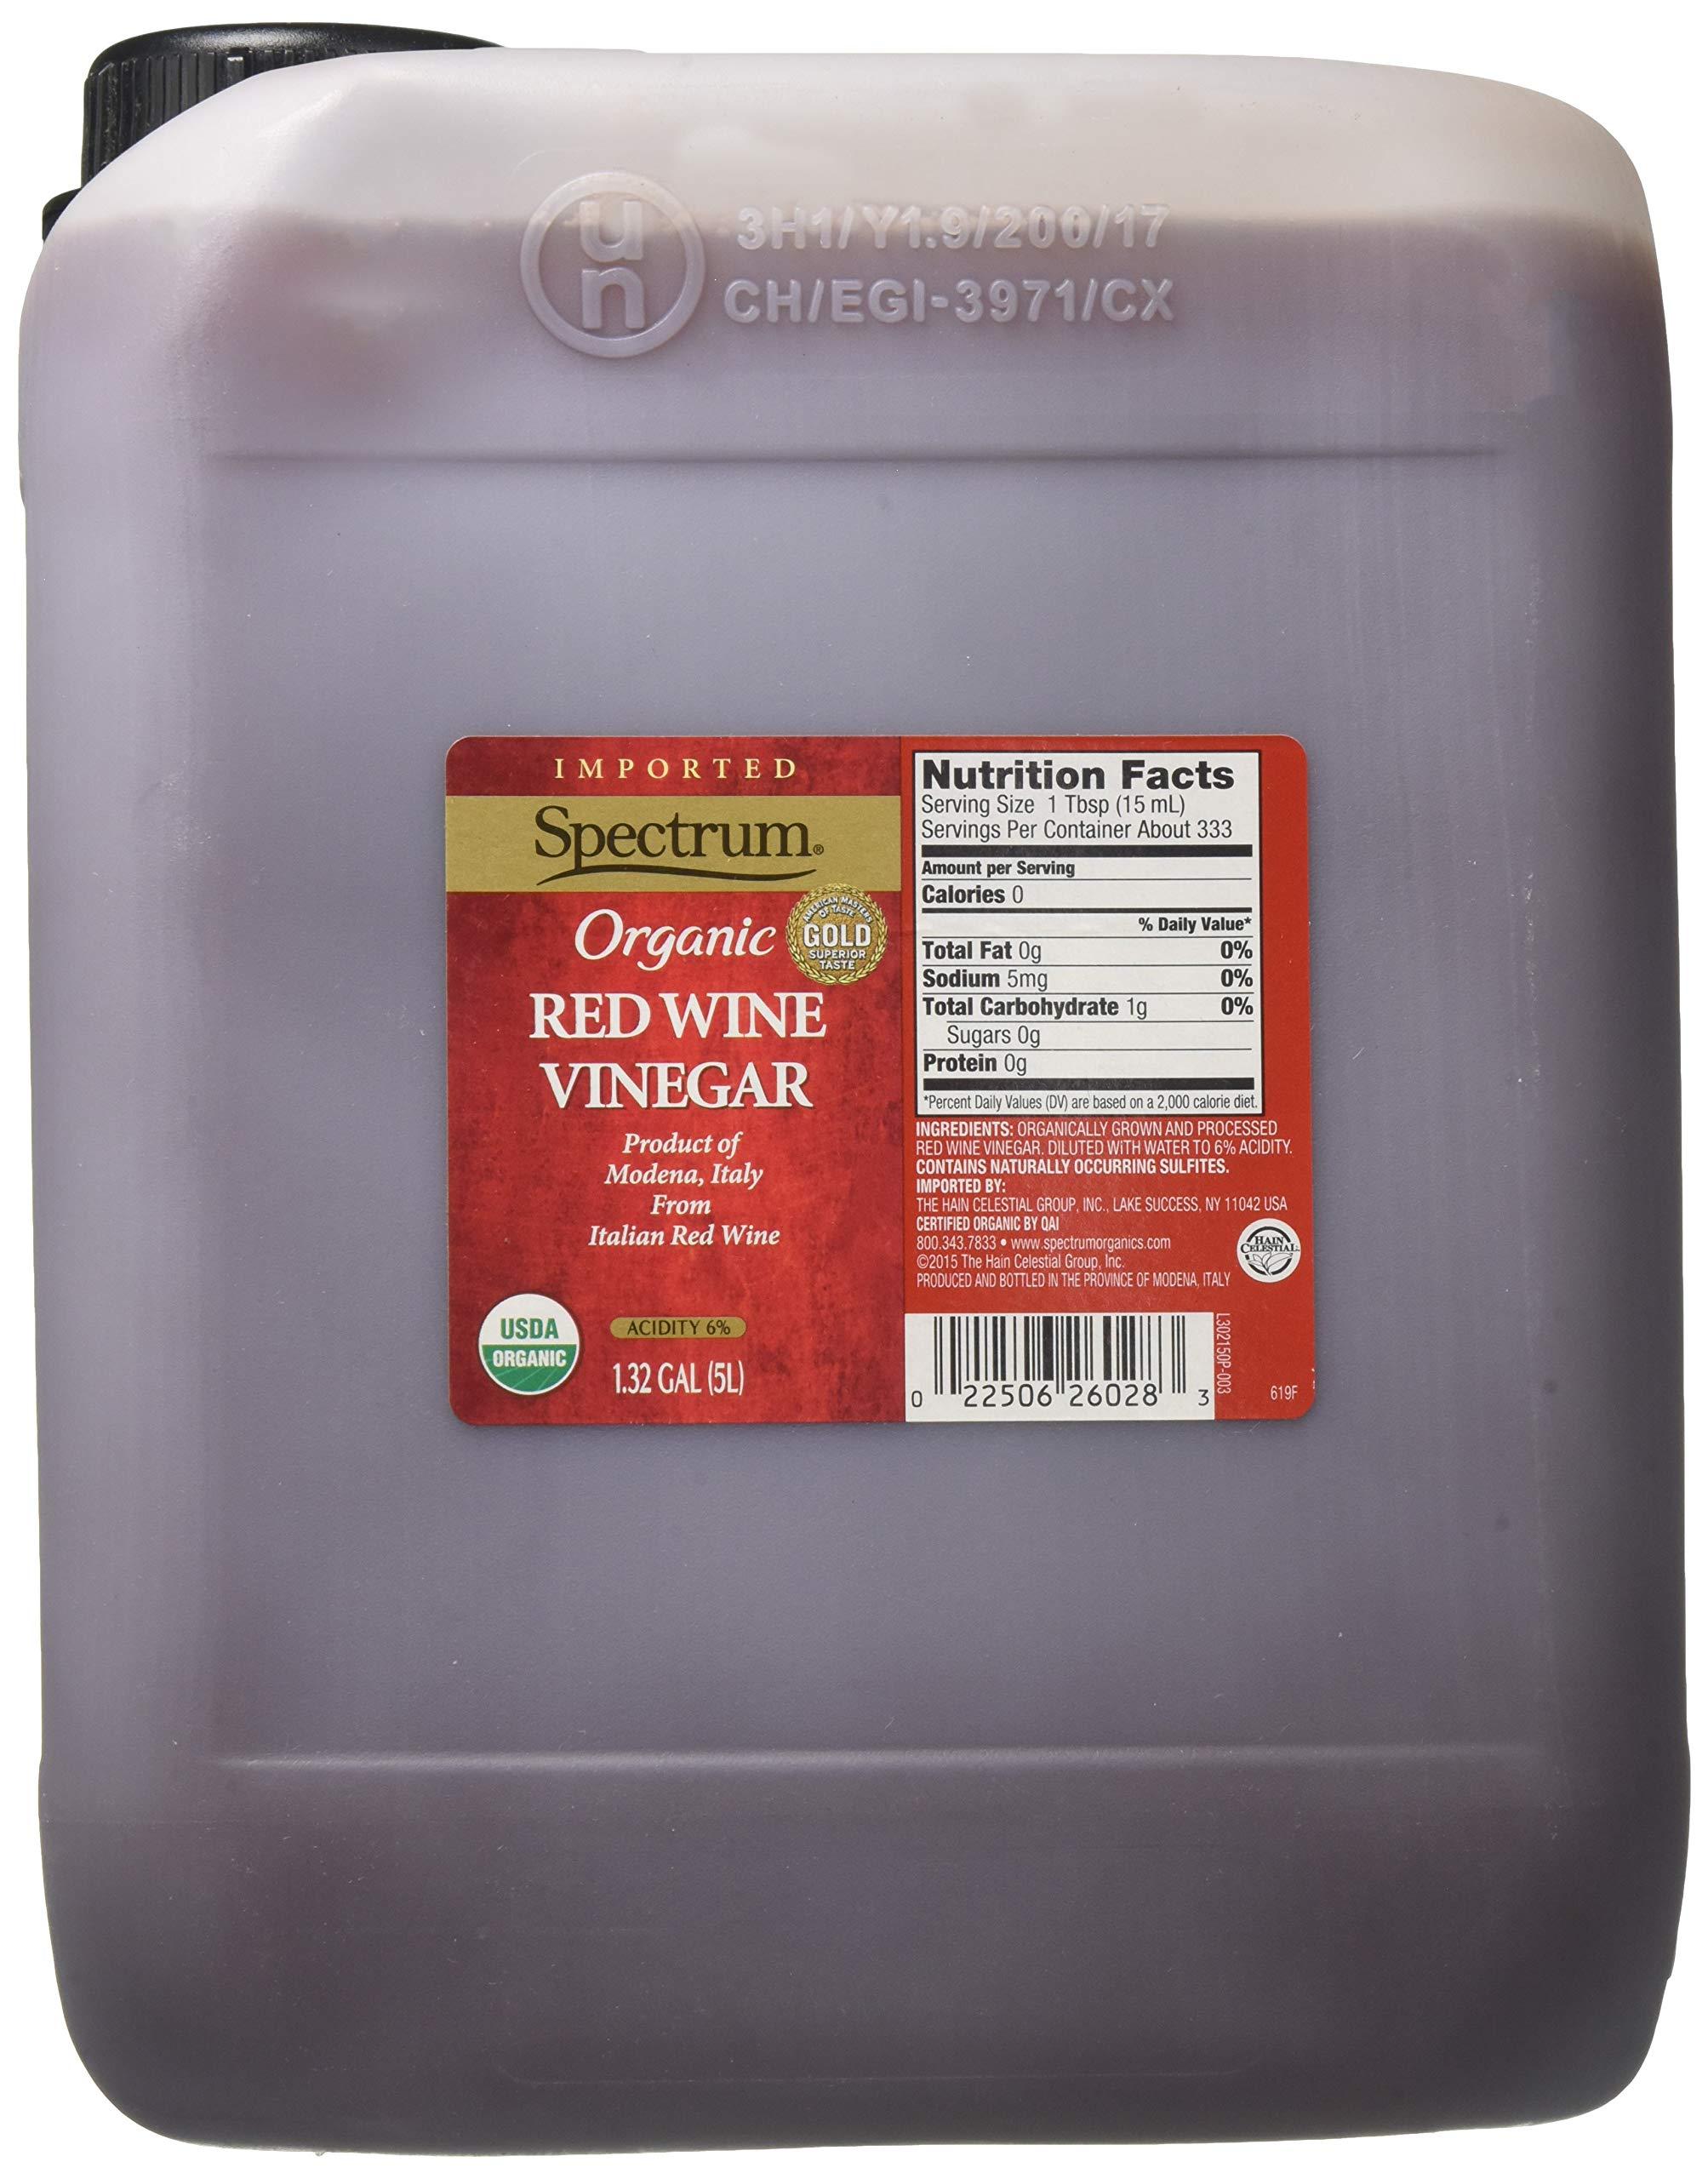 Spectrum Naturals Organic Red Wine Vinegar, 168.96 Ounce by Spectrum